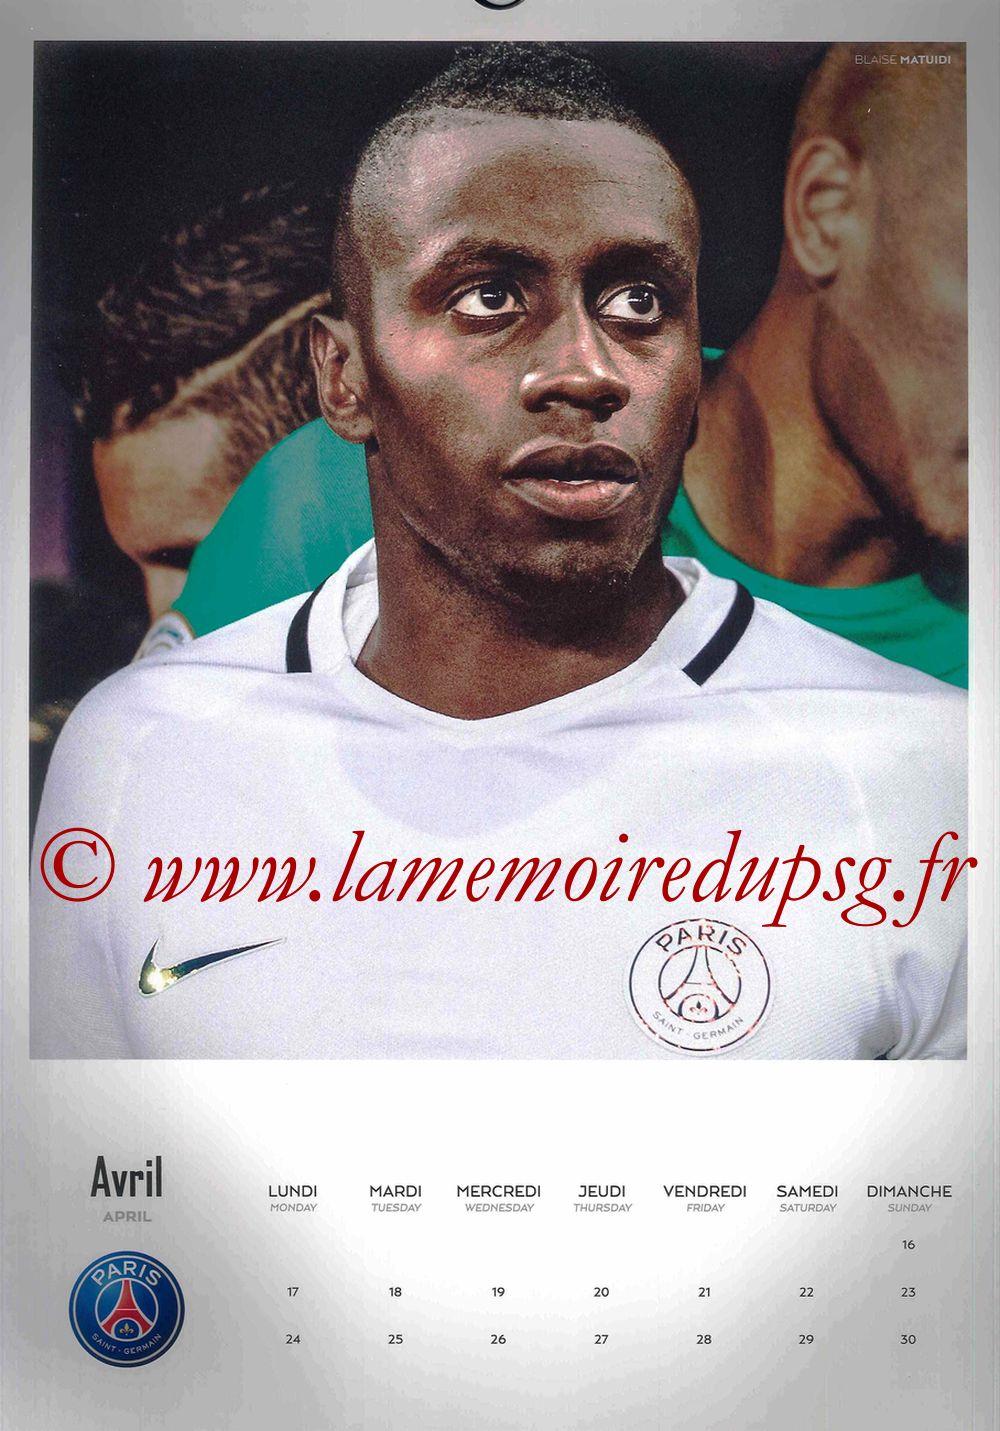 Calendrier PSG 2017 - Page 08 - Blaise MATUIDI